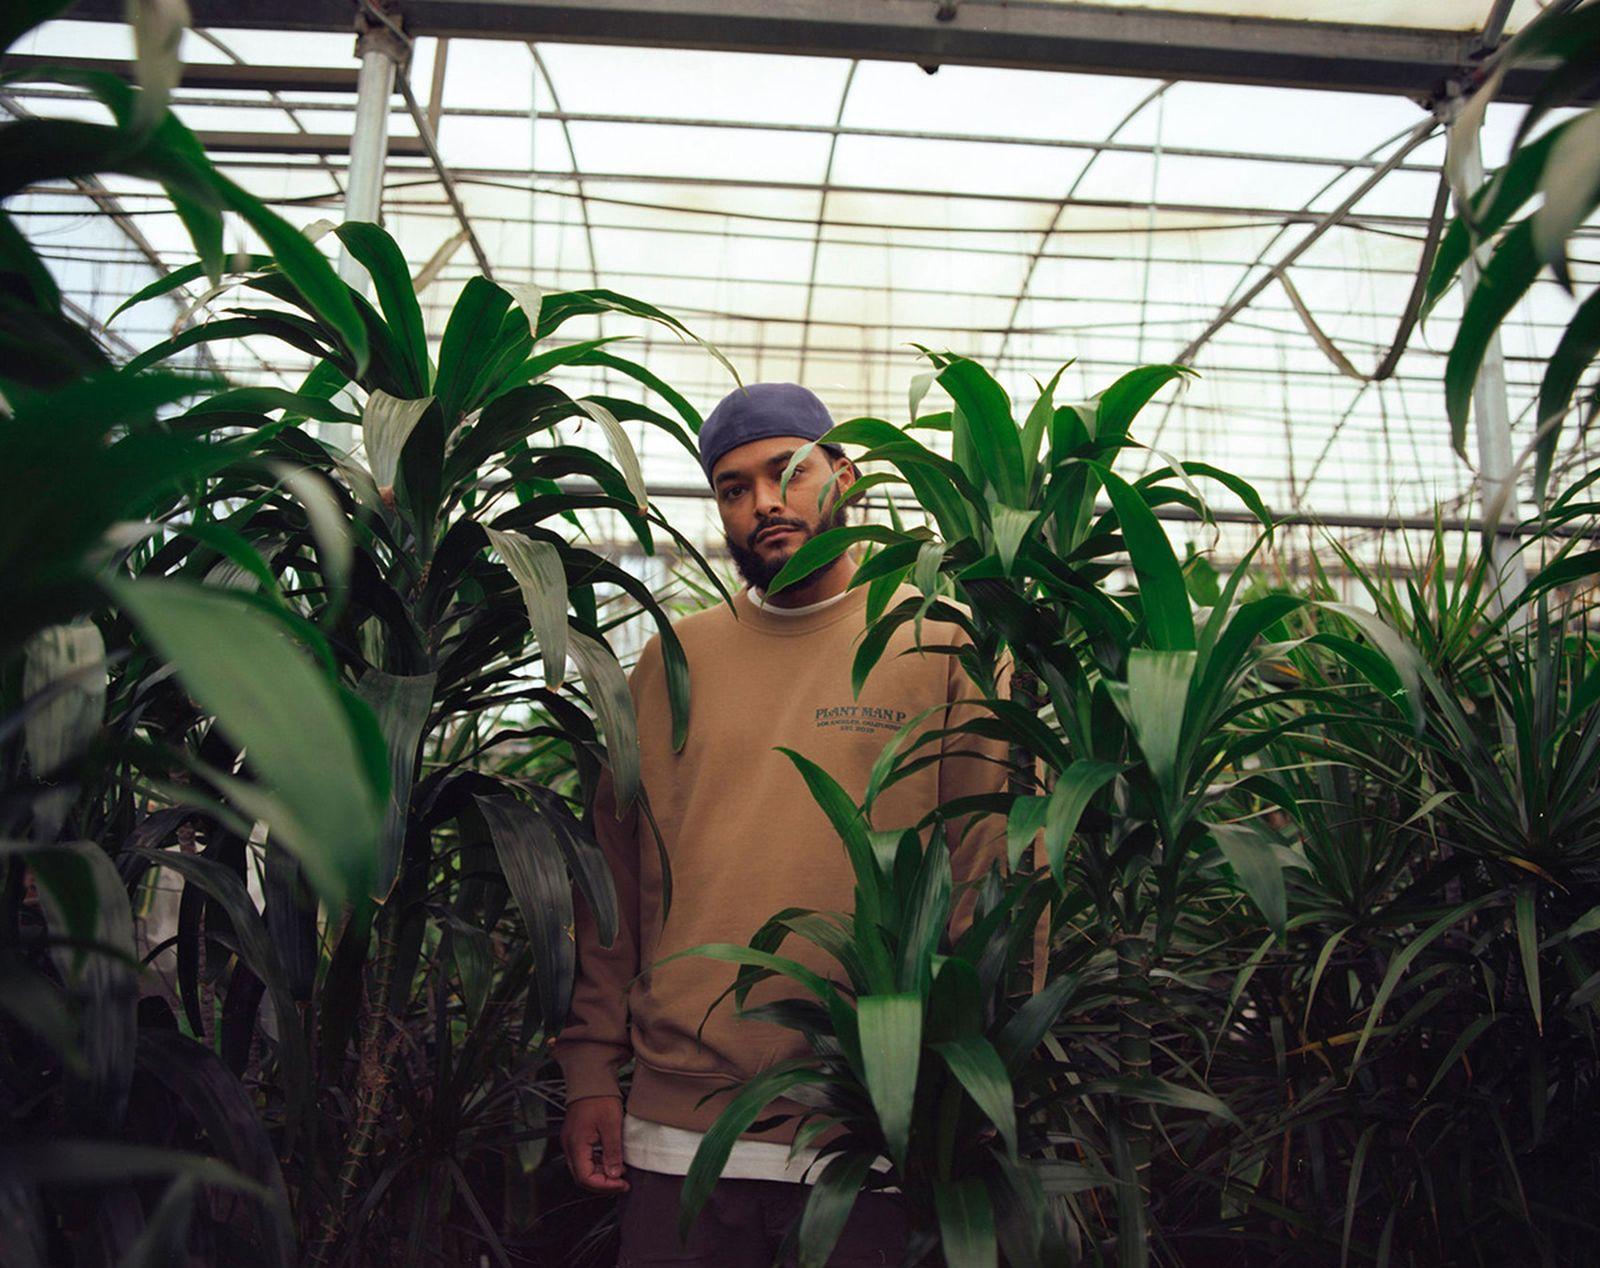 plant-man-p-hm-blank-staples-new-07